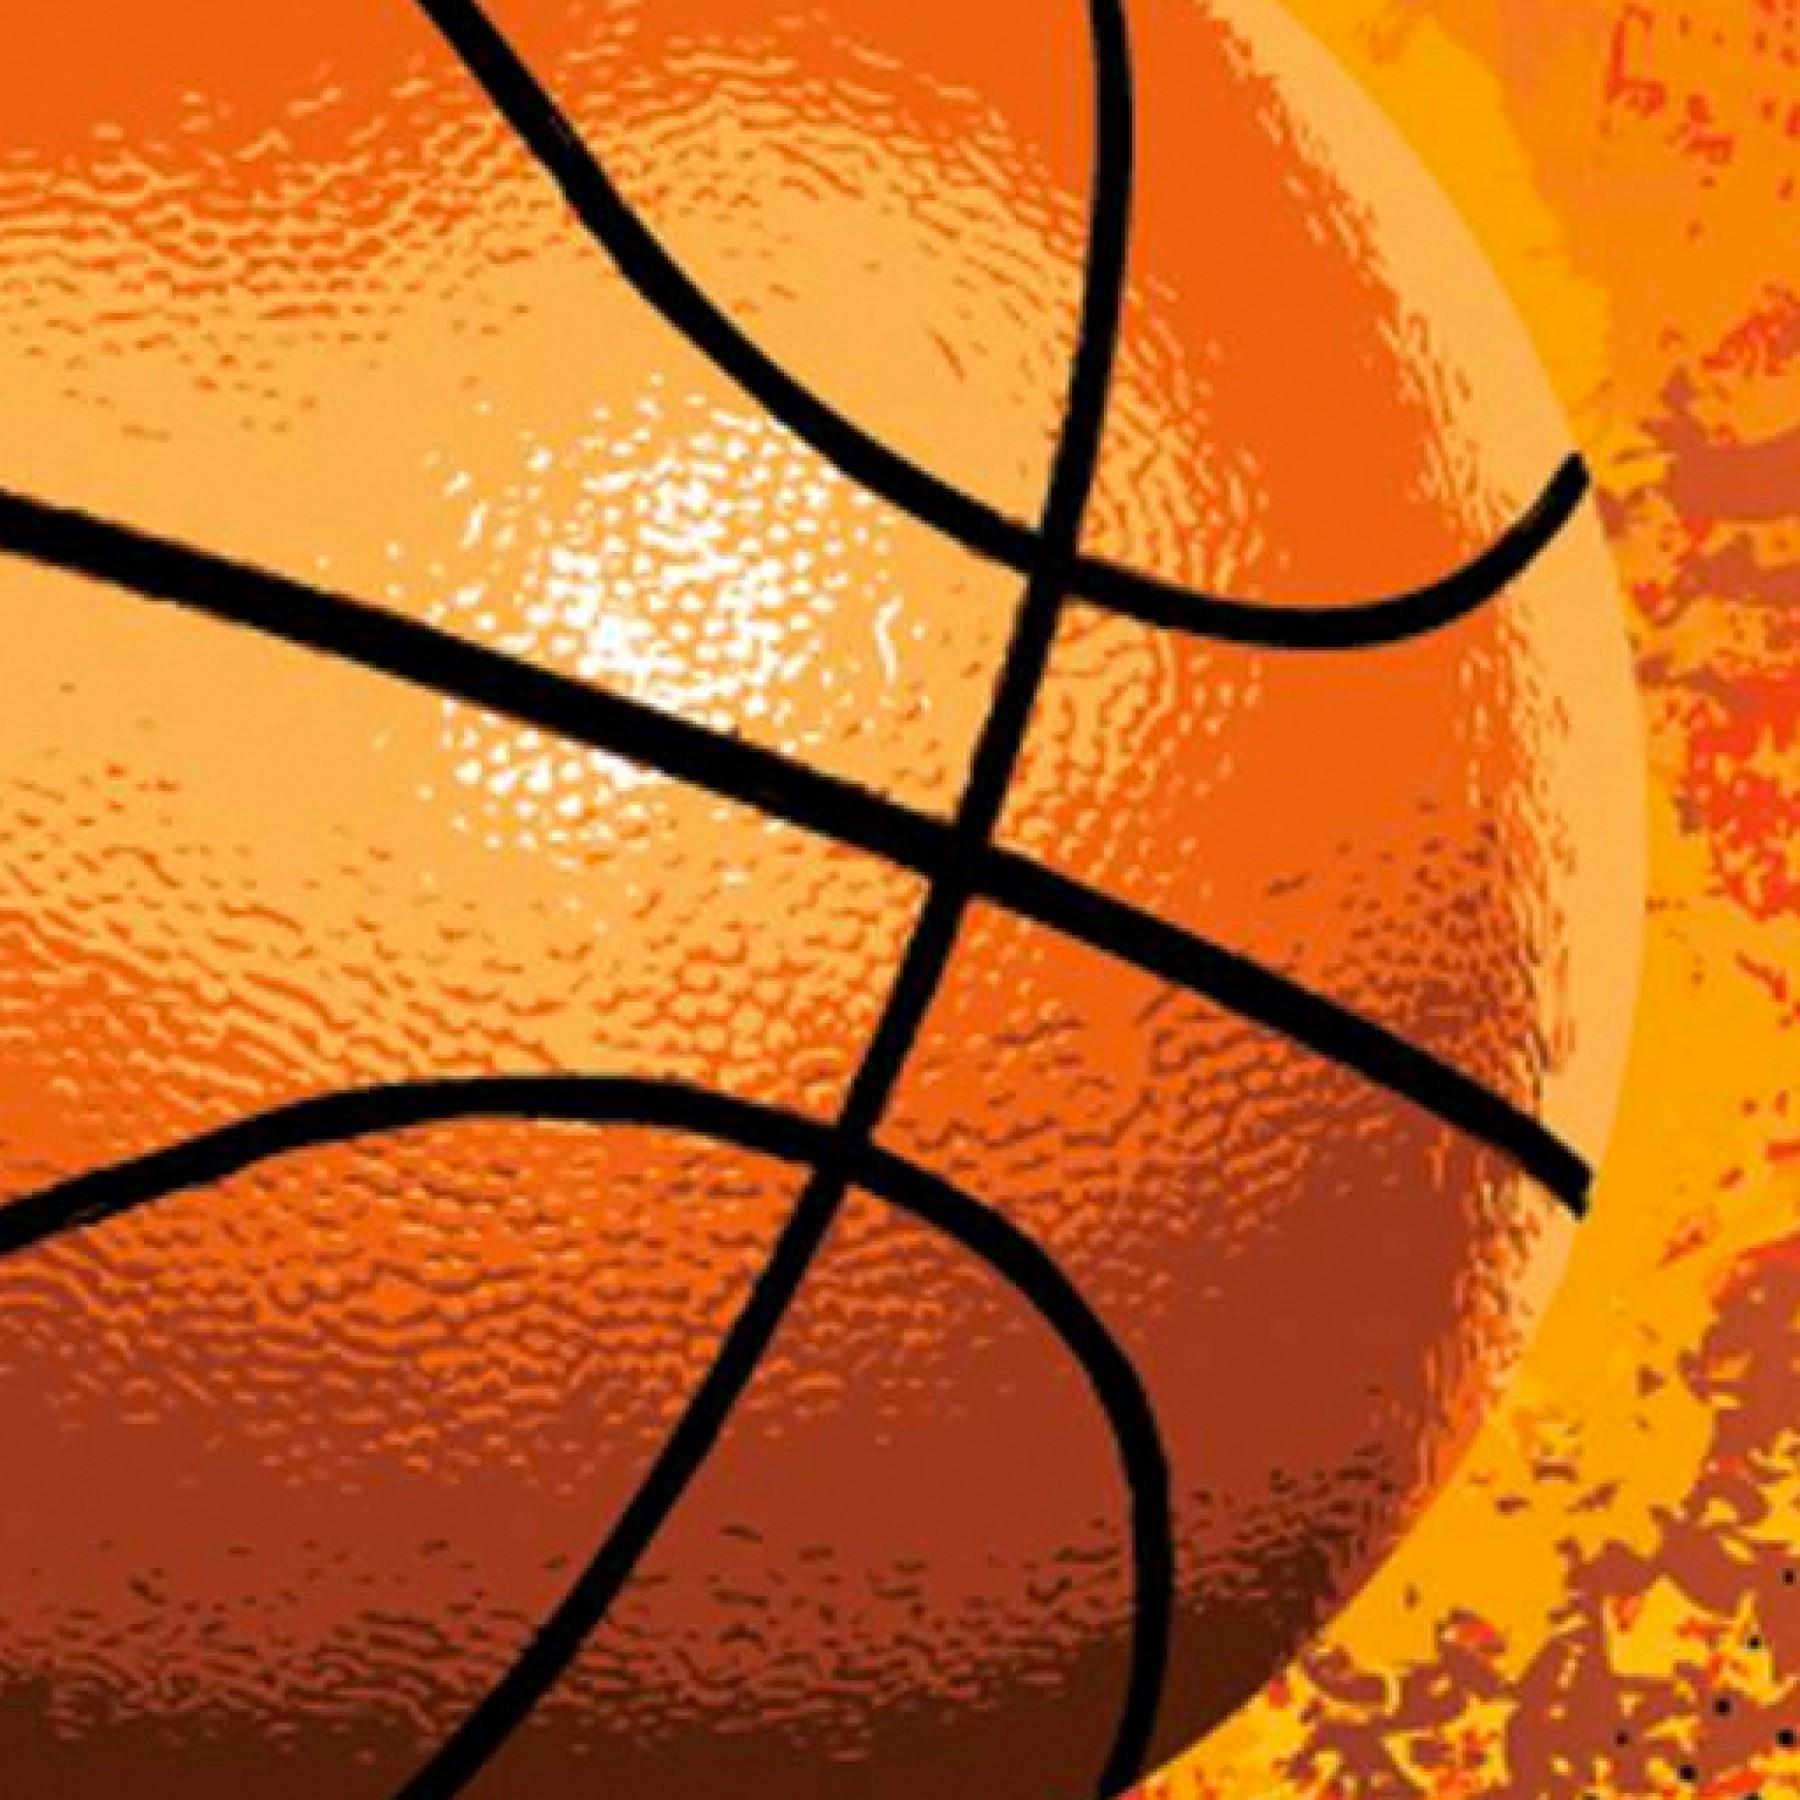 slam-dunk-kids-sports-adults-main-location1